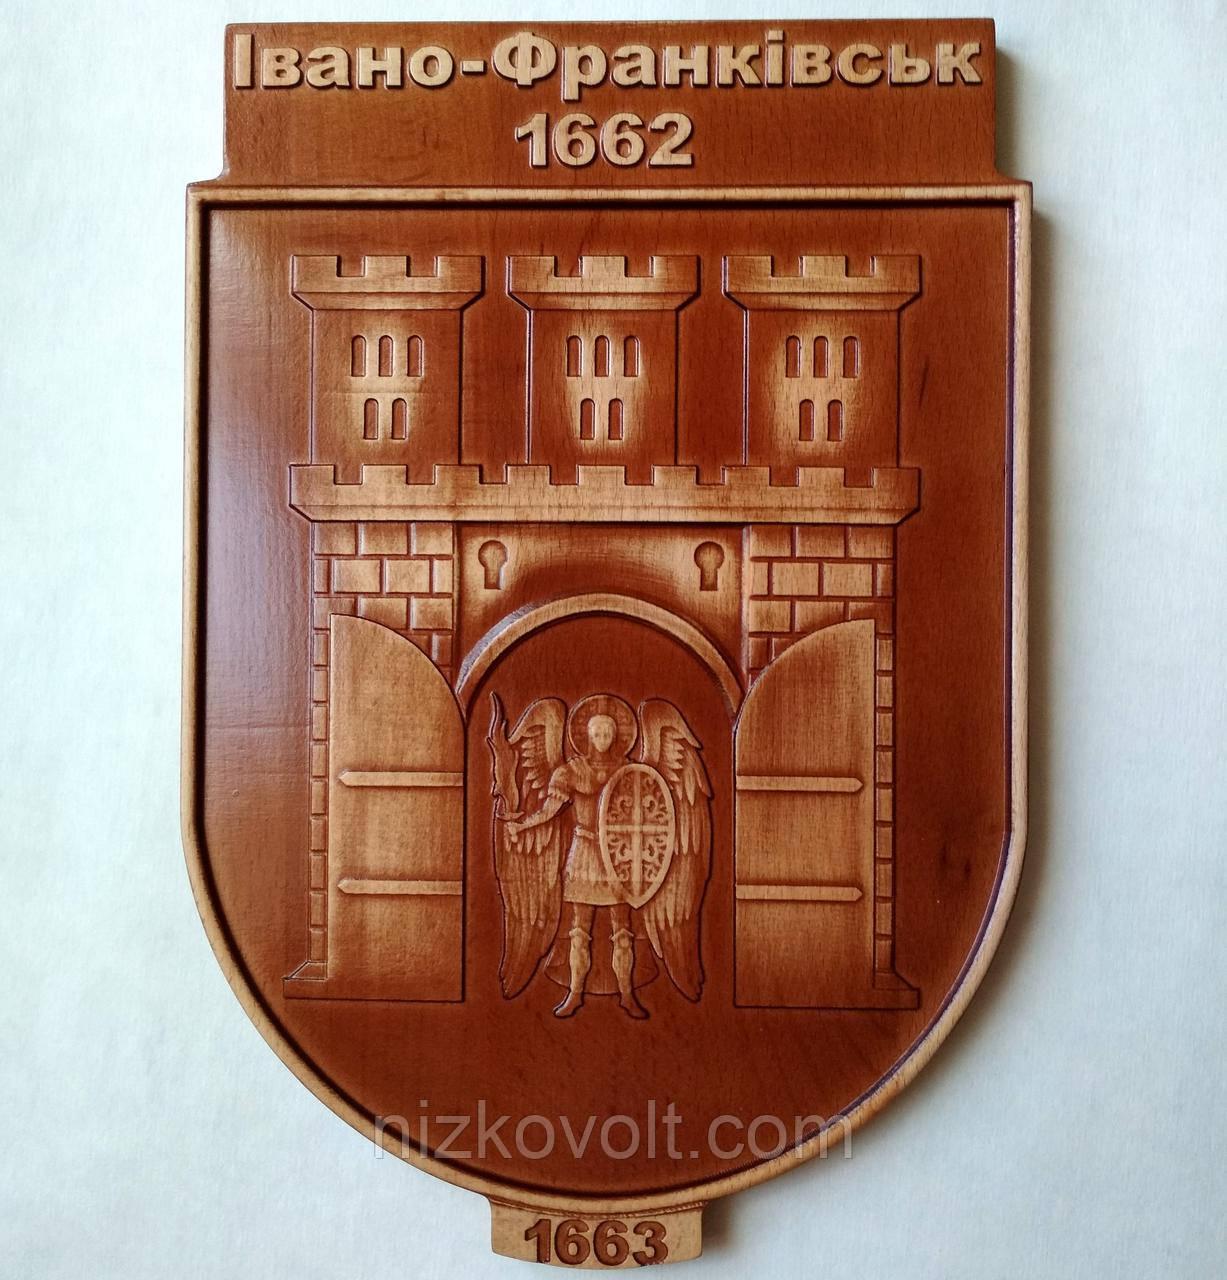 Деревянный резной герб Ивано-Франковска 200х295х18 мм, фото 1